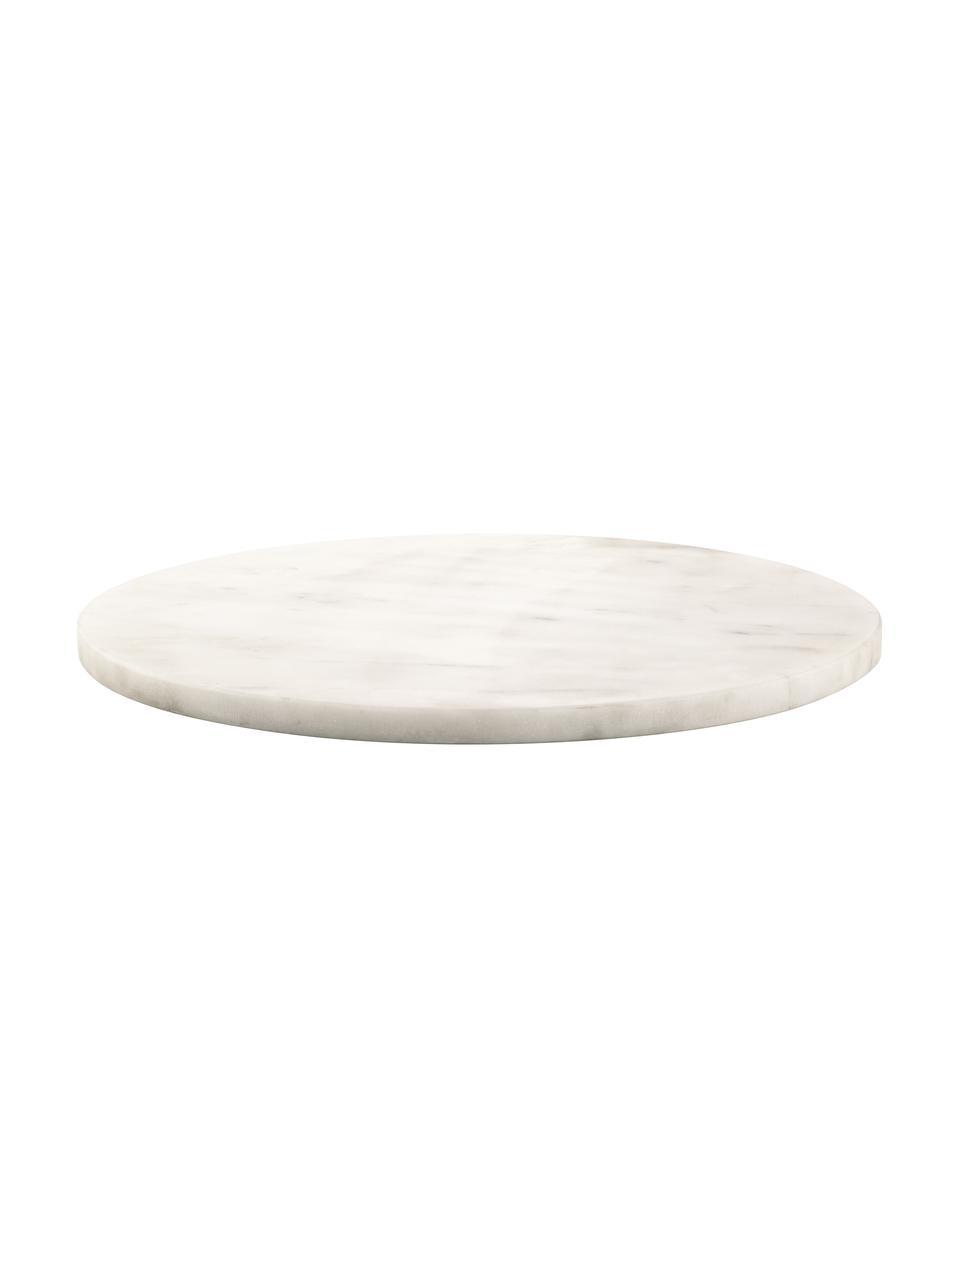 Półmisek z marmuru Minu, Marmur, Biały, 30 cm